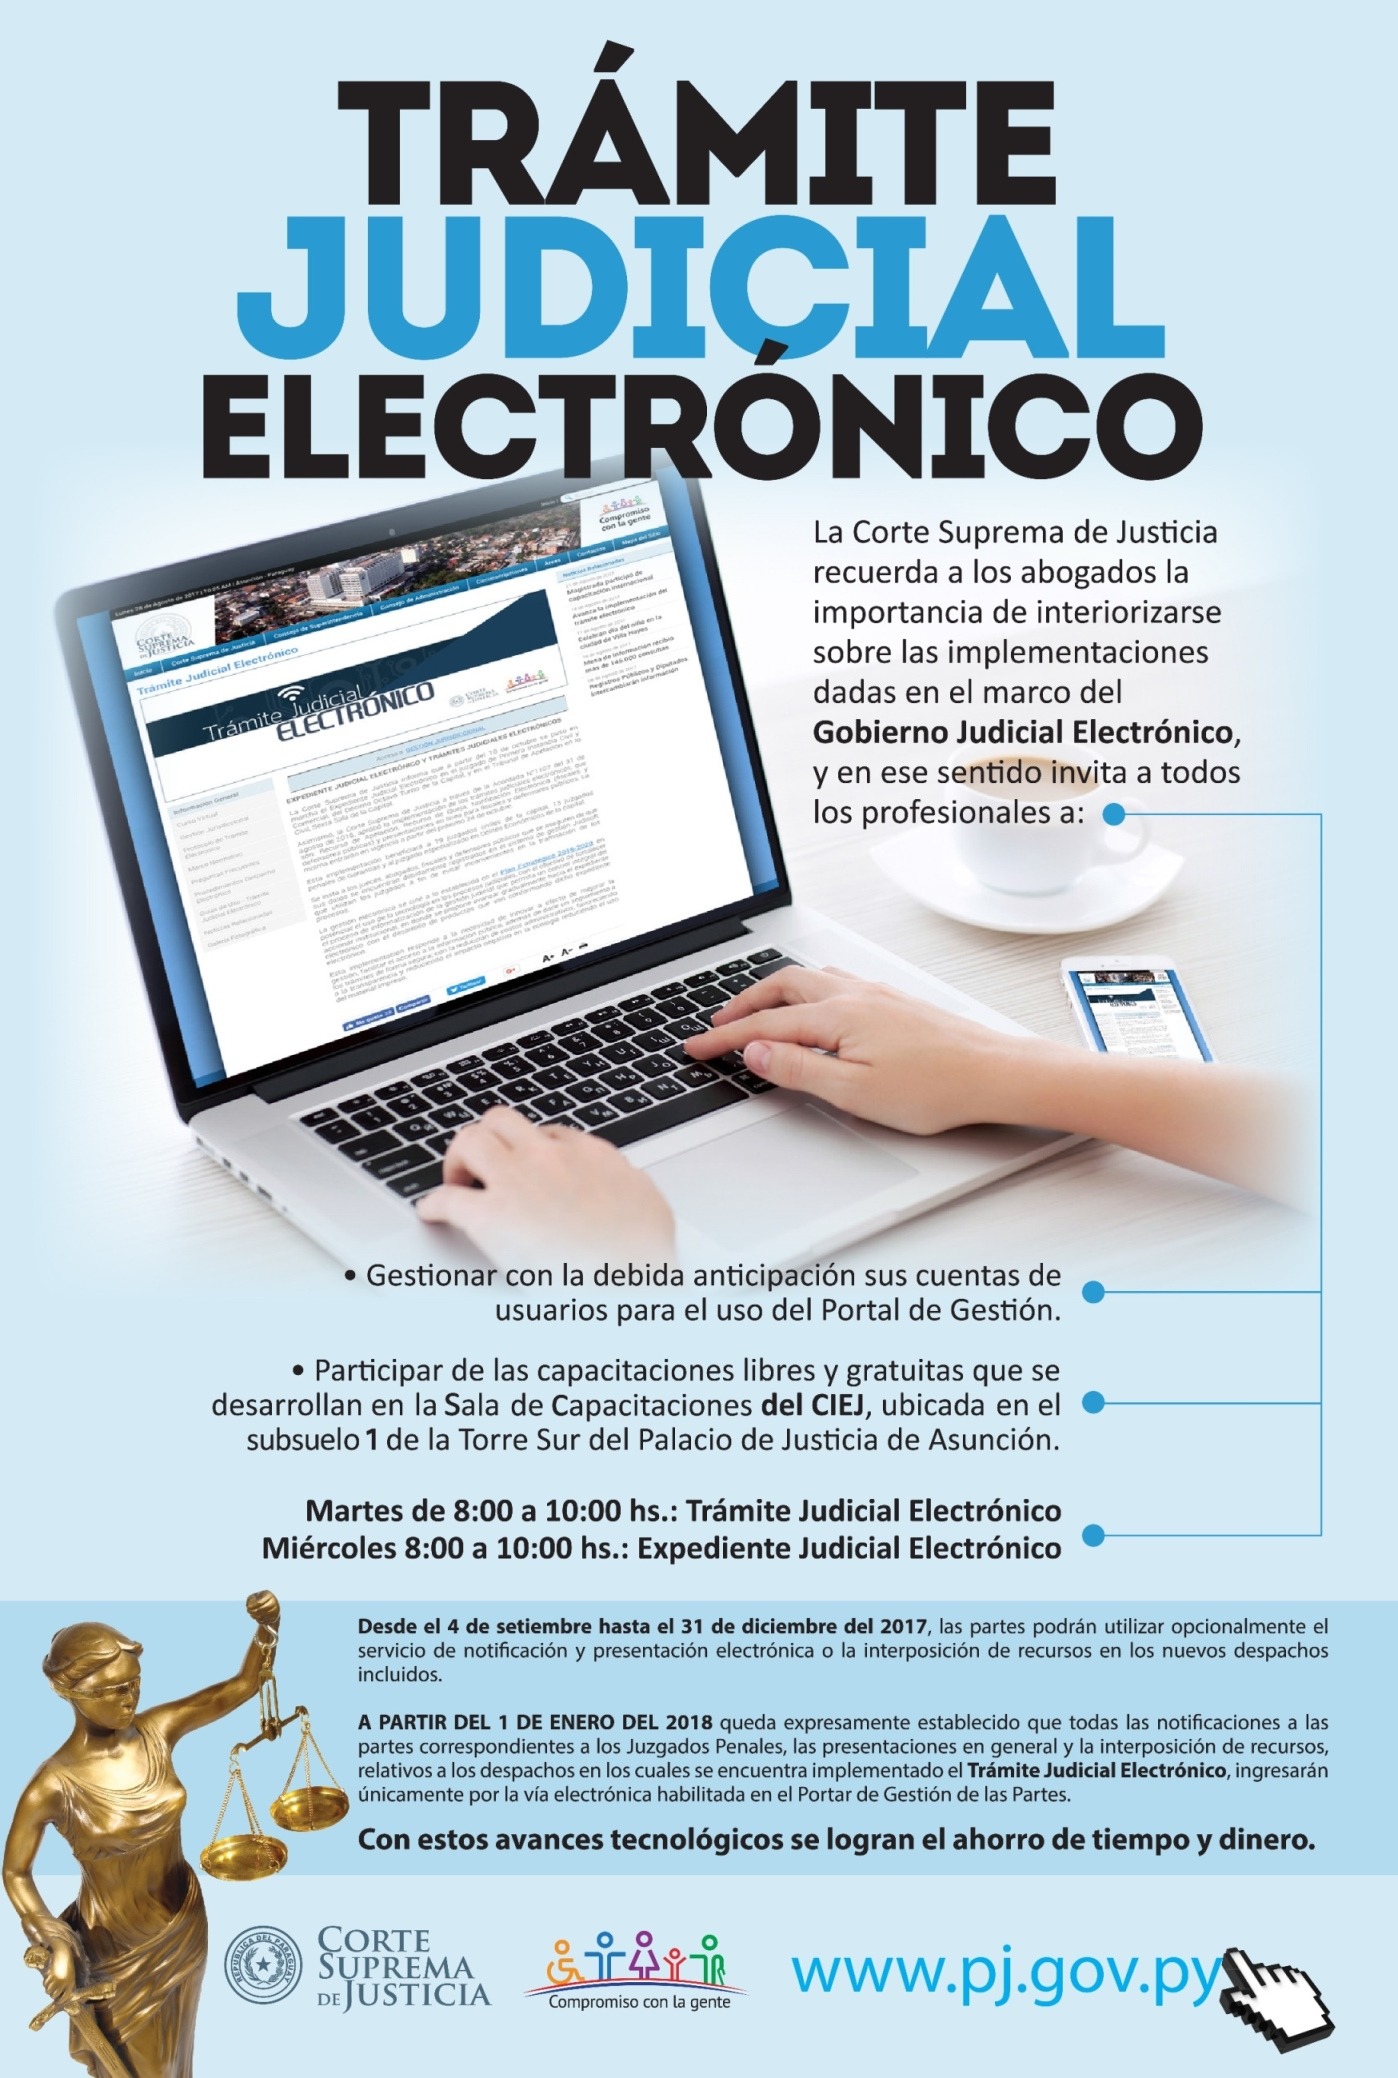 Trámite Judicial Electrónico - Poder Judicial